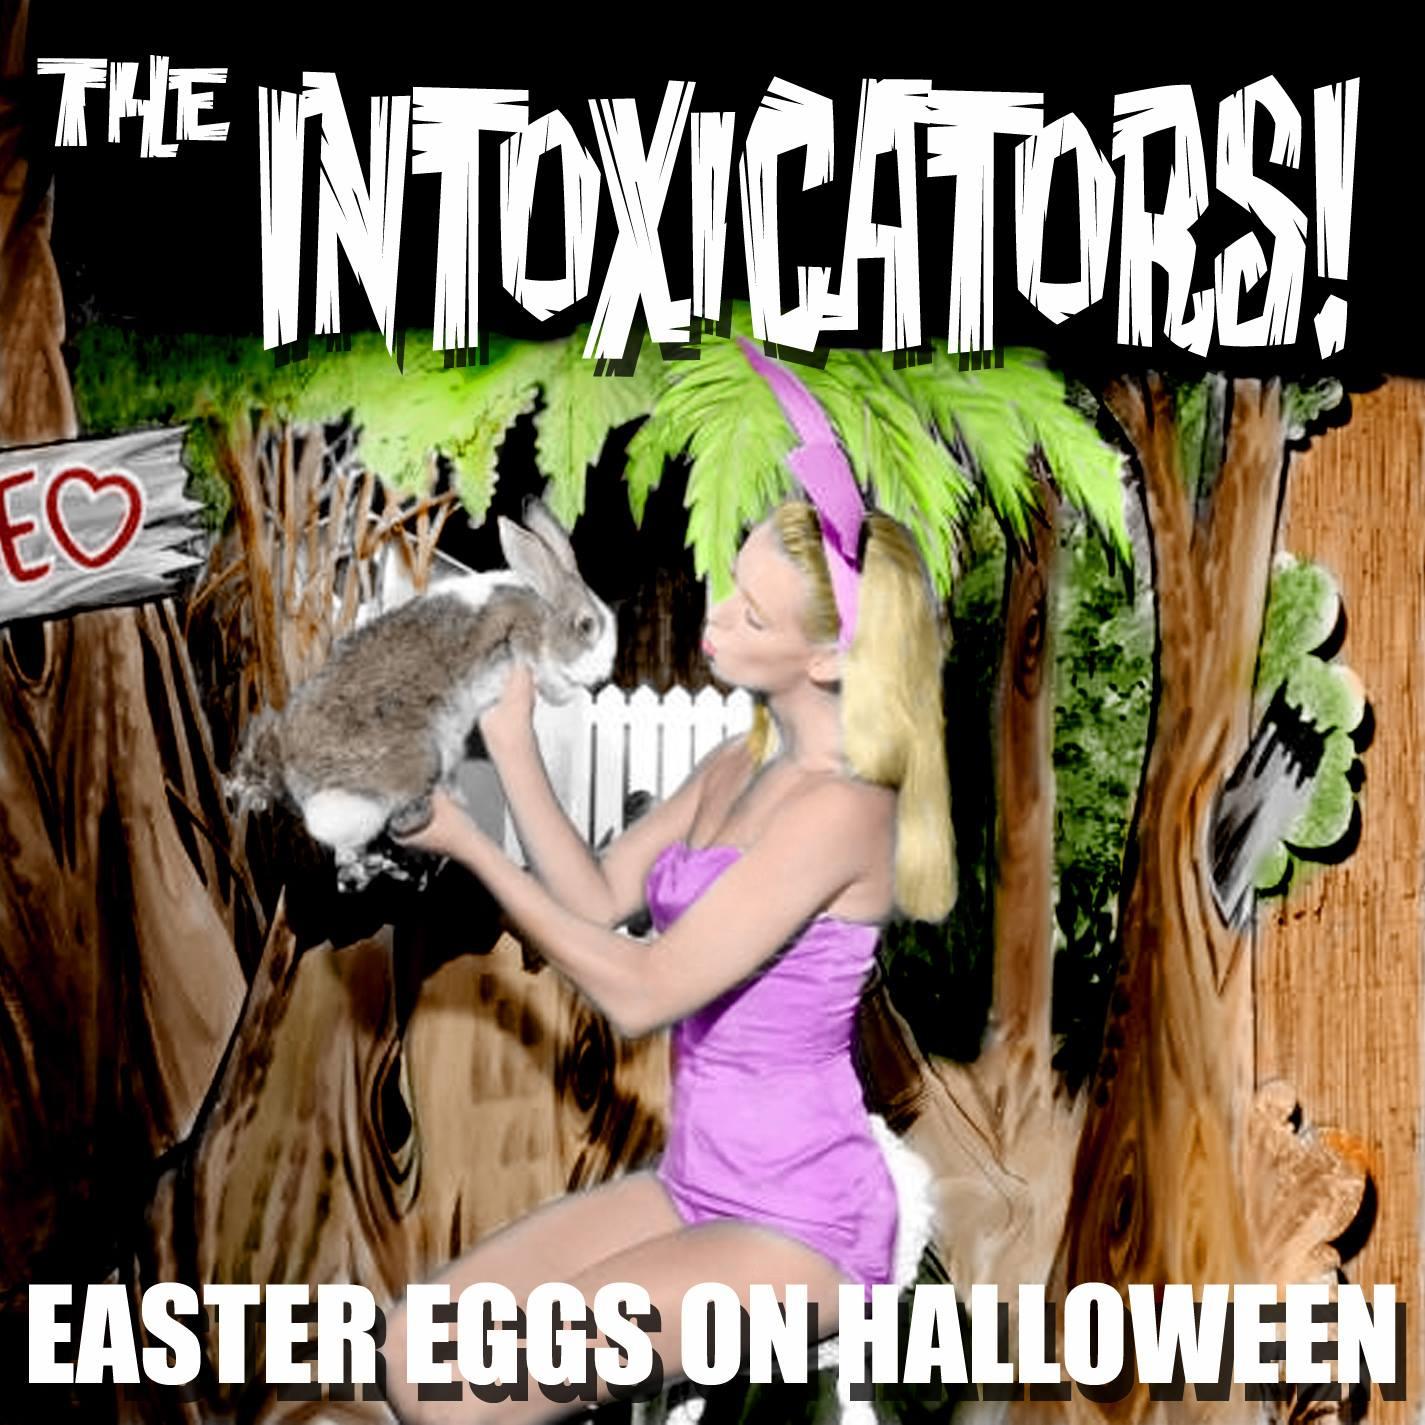 The Intoxicators - Eeaster Eggs on Halloween